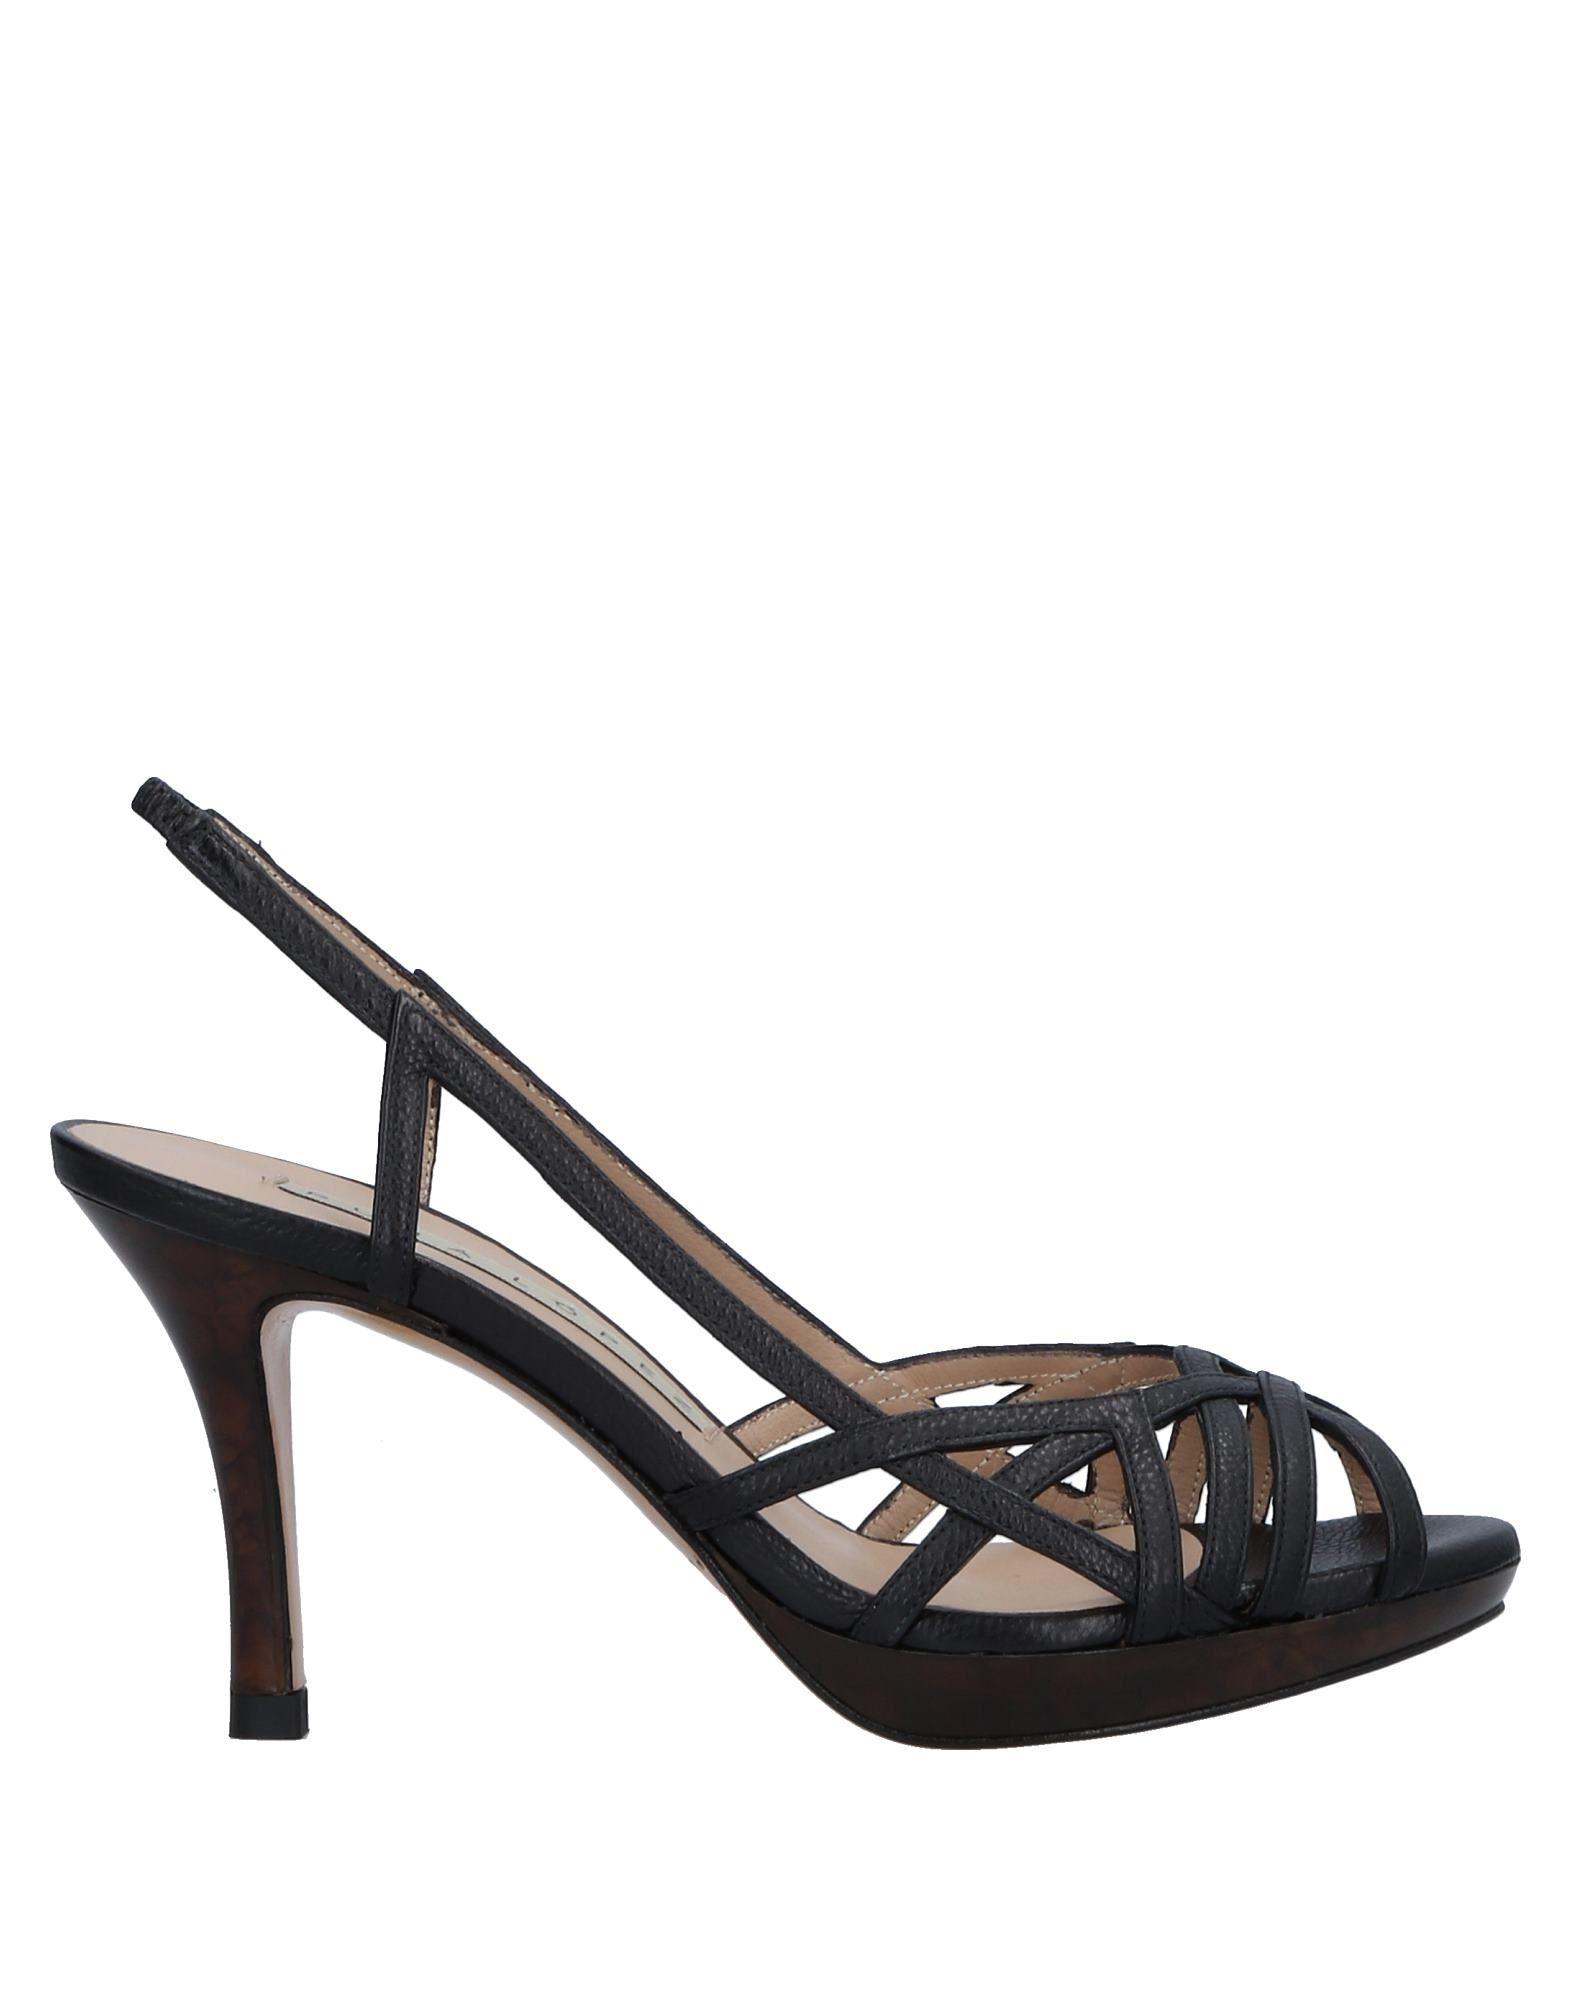 Pura López Sandalen Damen  11520810LBGut aussehende strapazierfähige Schuhe